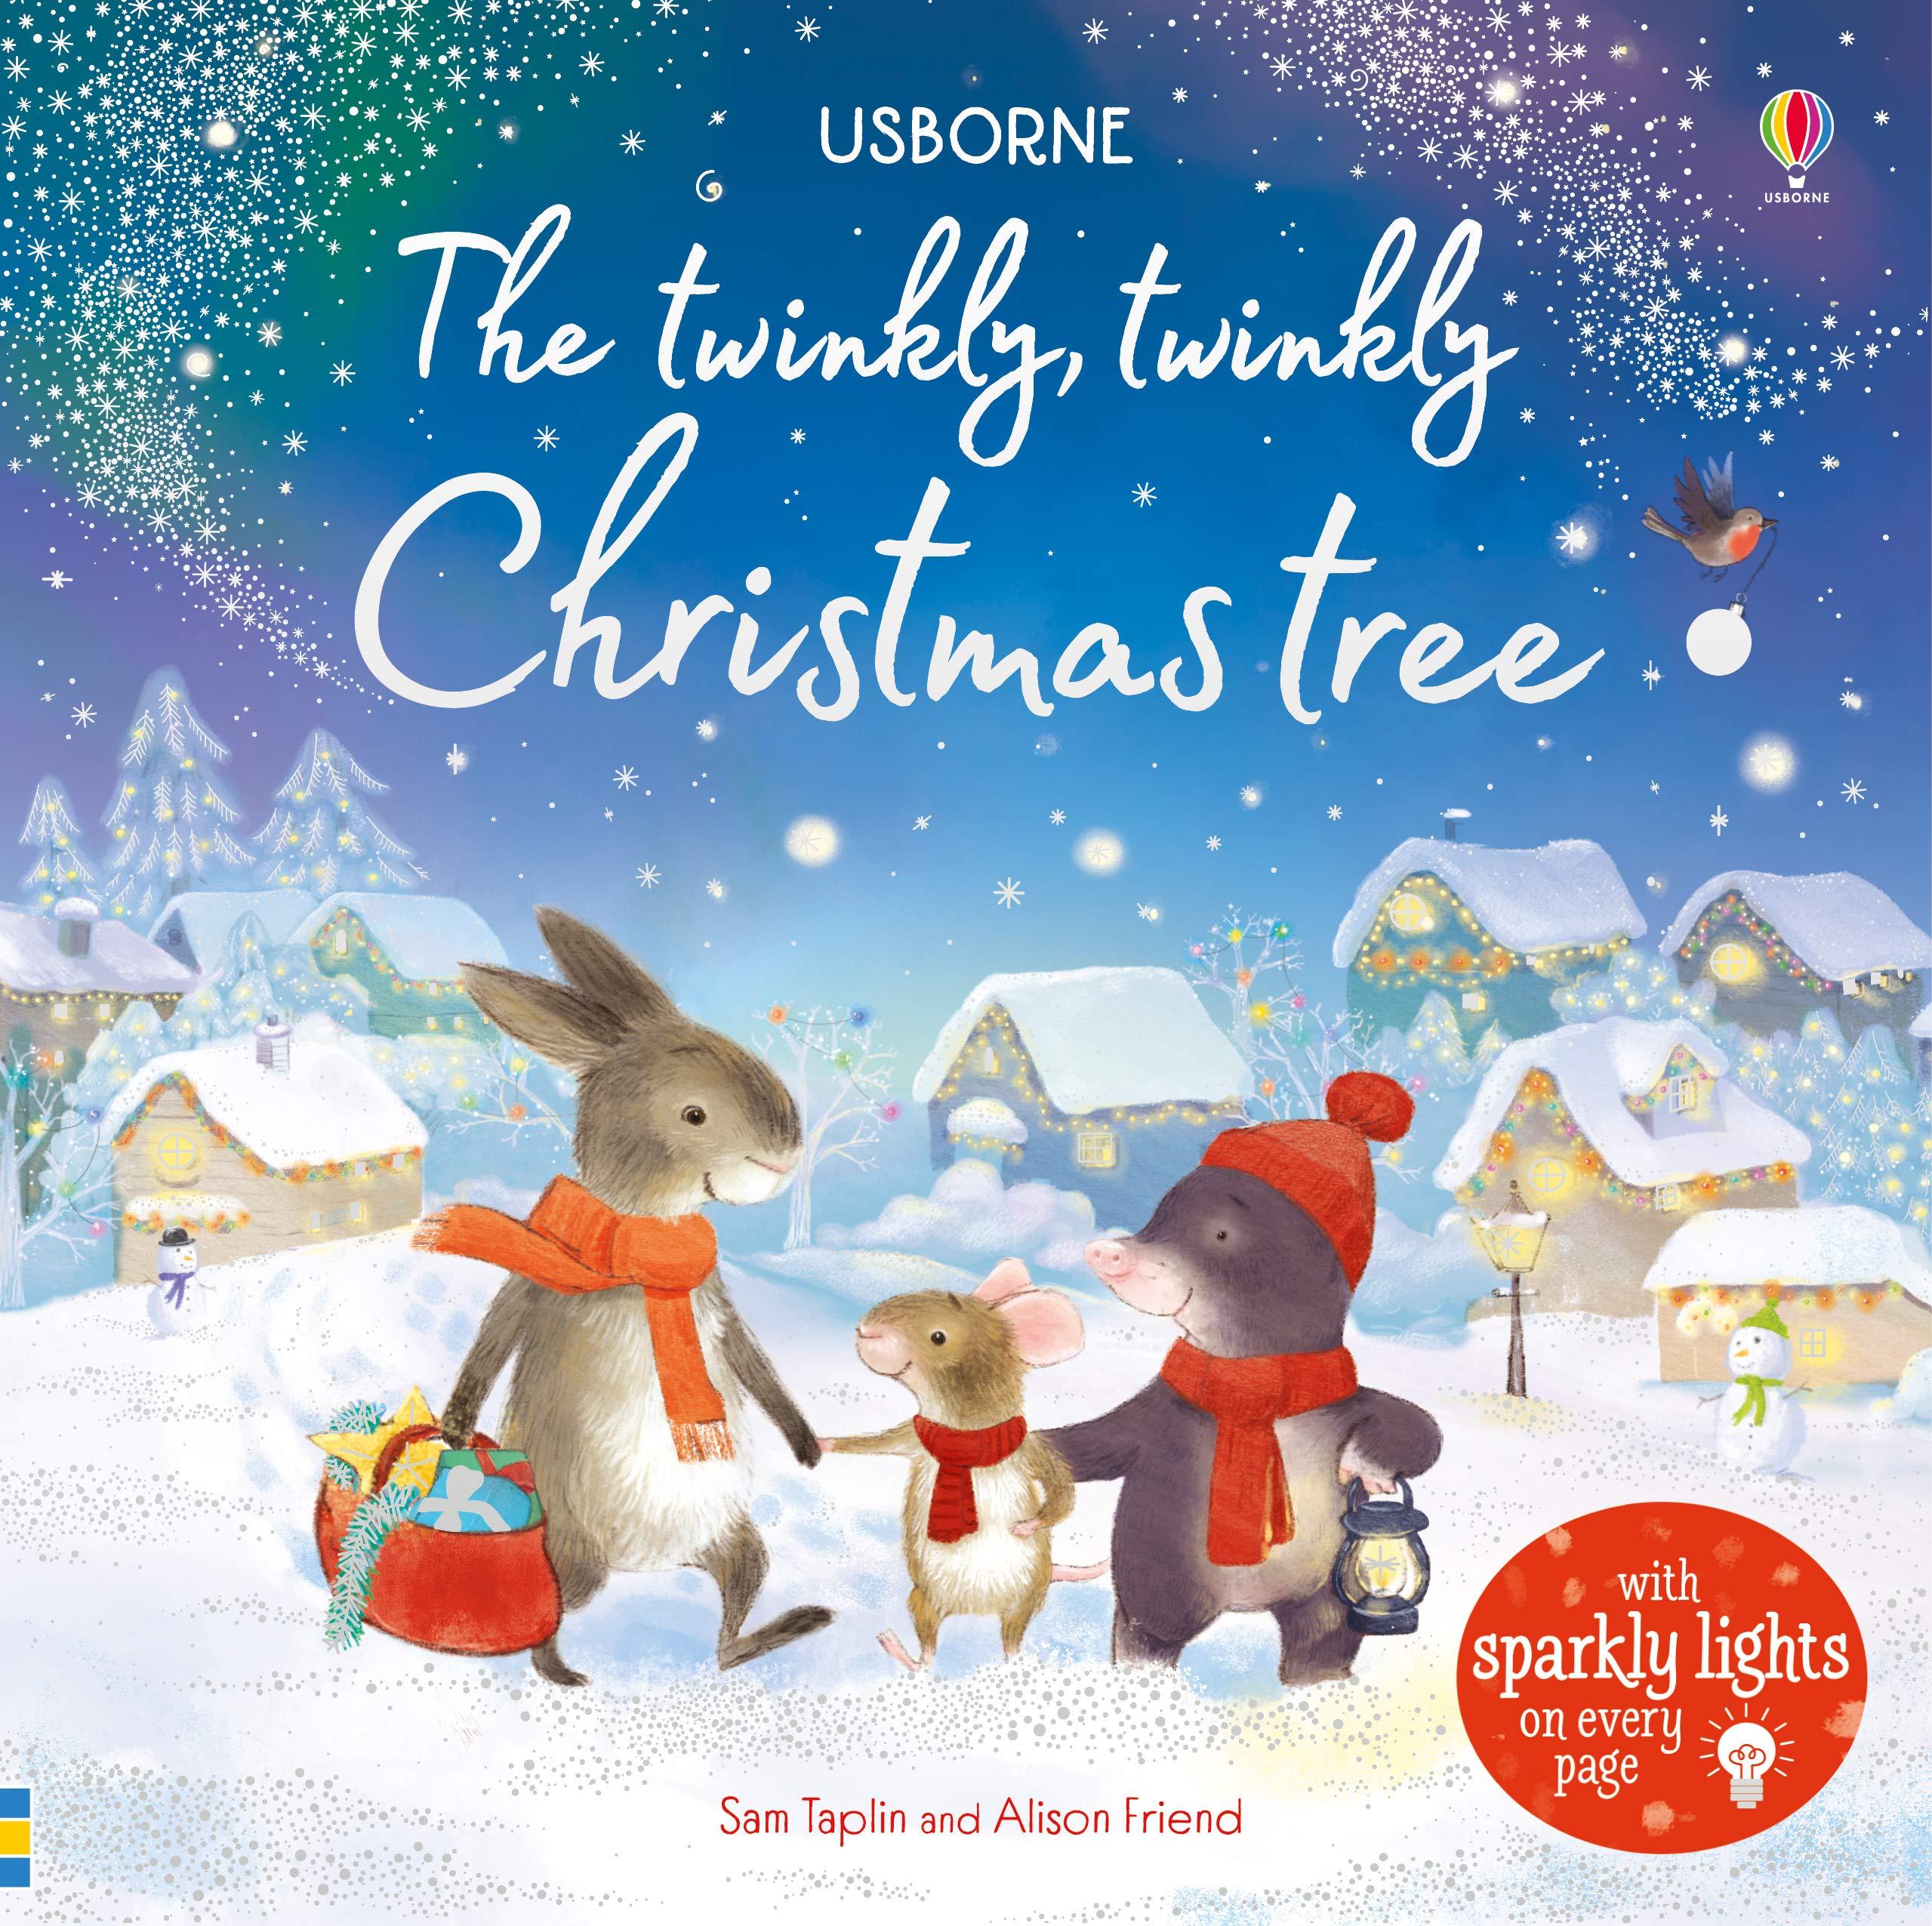 Usborne Christmas 2019 The Twinkly Twinkly Christmas Tree (Usborne Twinkly Books